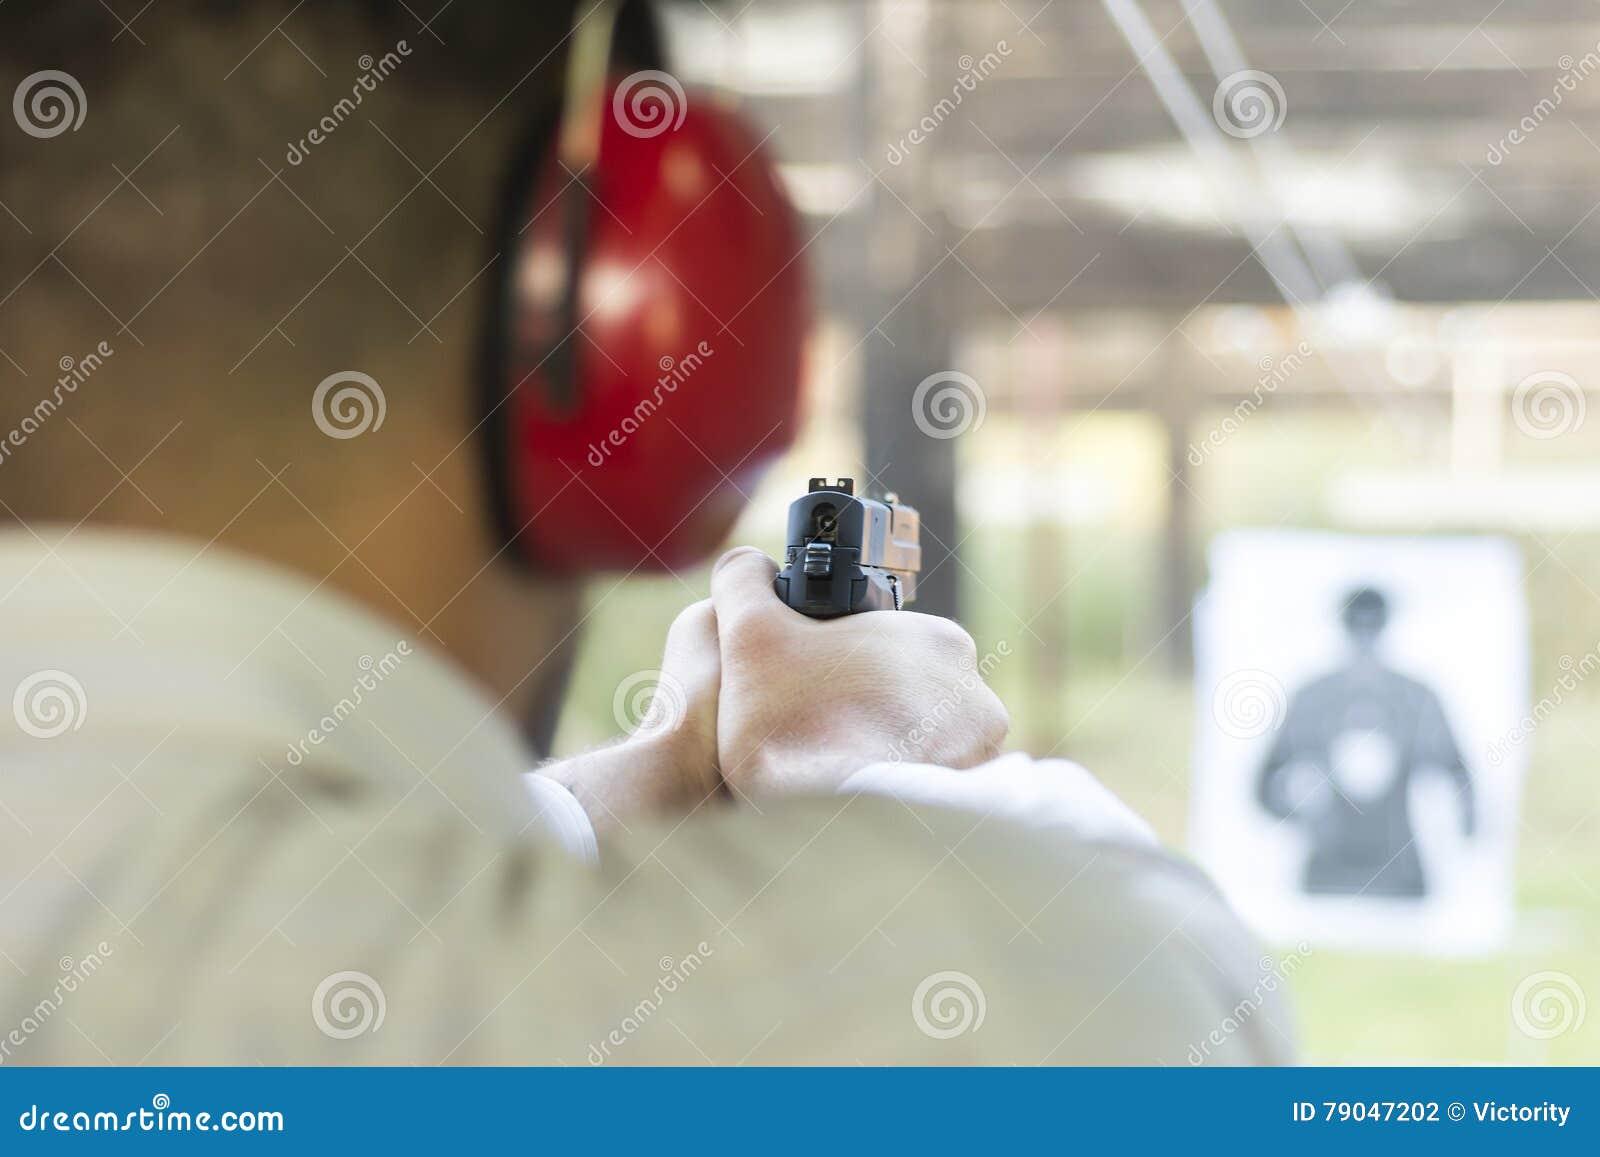 shooting target bitten apple royaltyfree stock